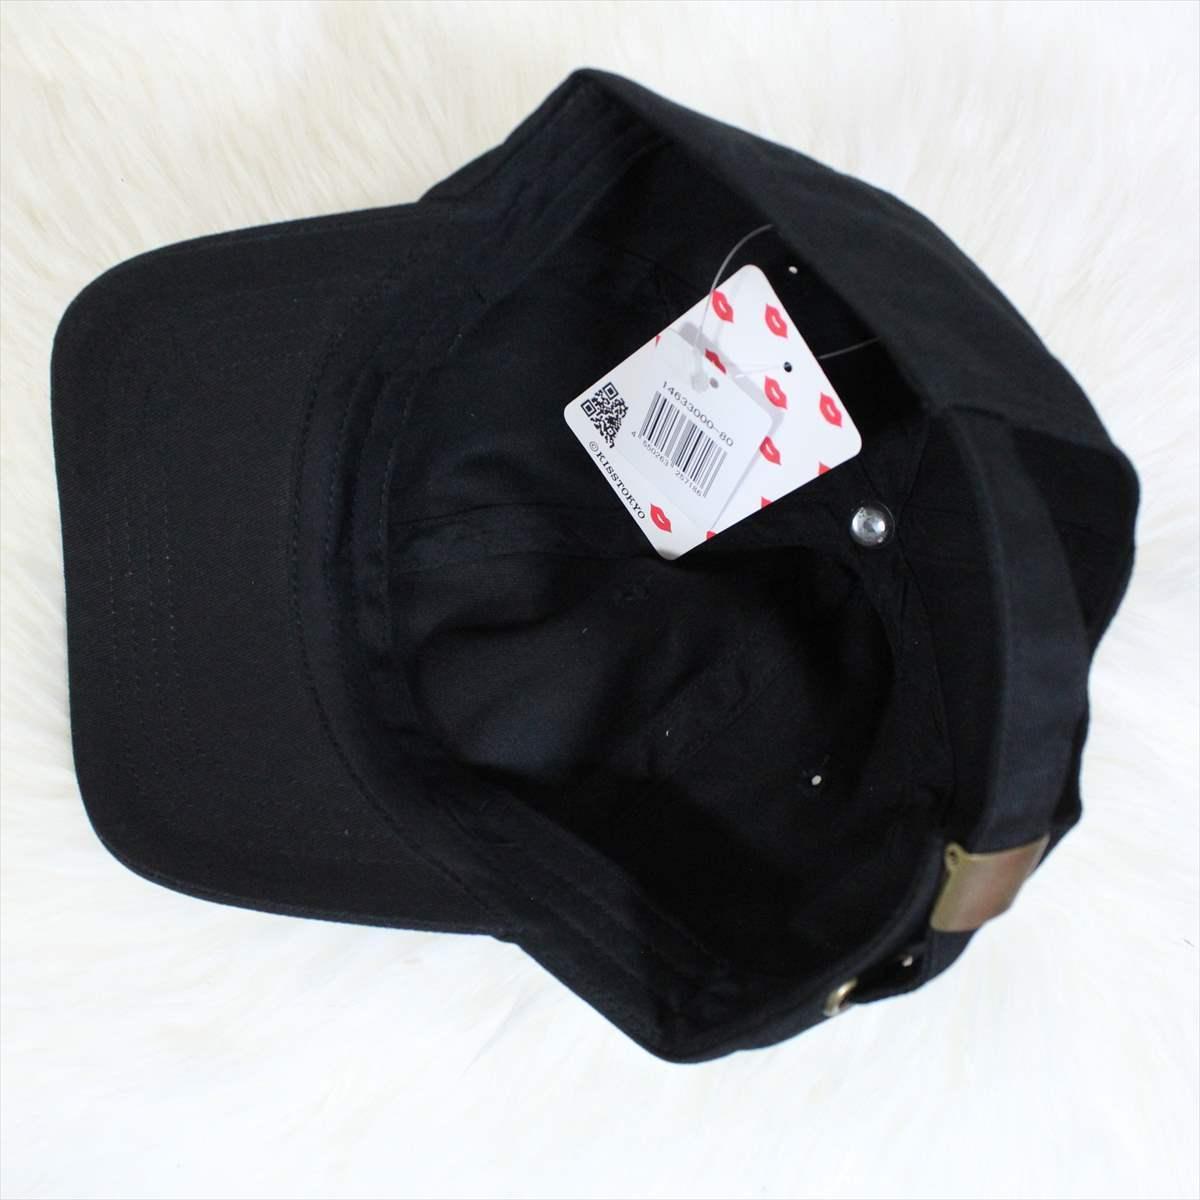 KISS TOKYO LIP LOGO LOW CAP サイドロゴ刺繍 ブラック キャップ 新品 黒 帽子_画像4